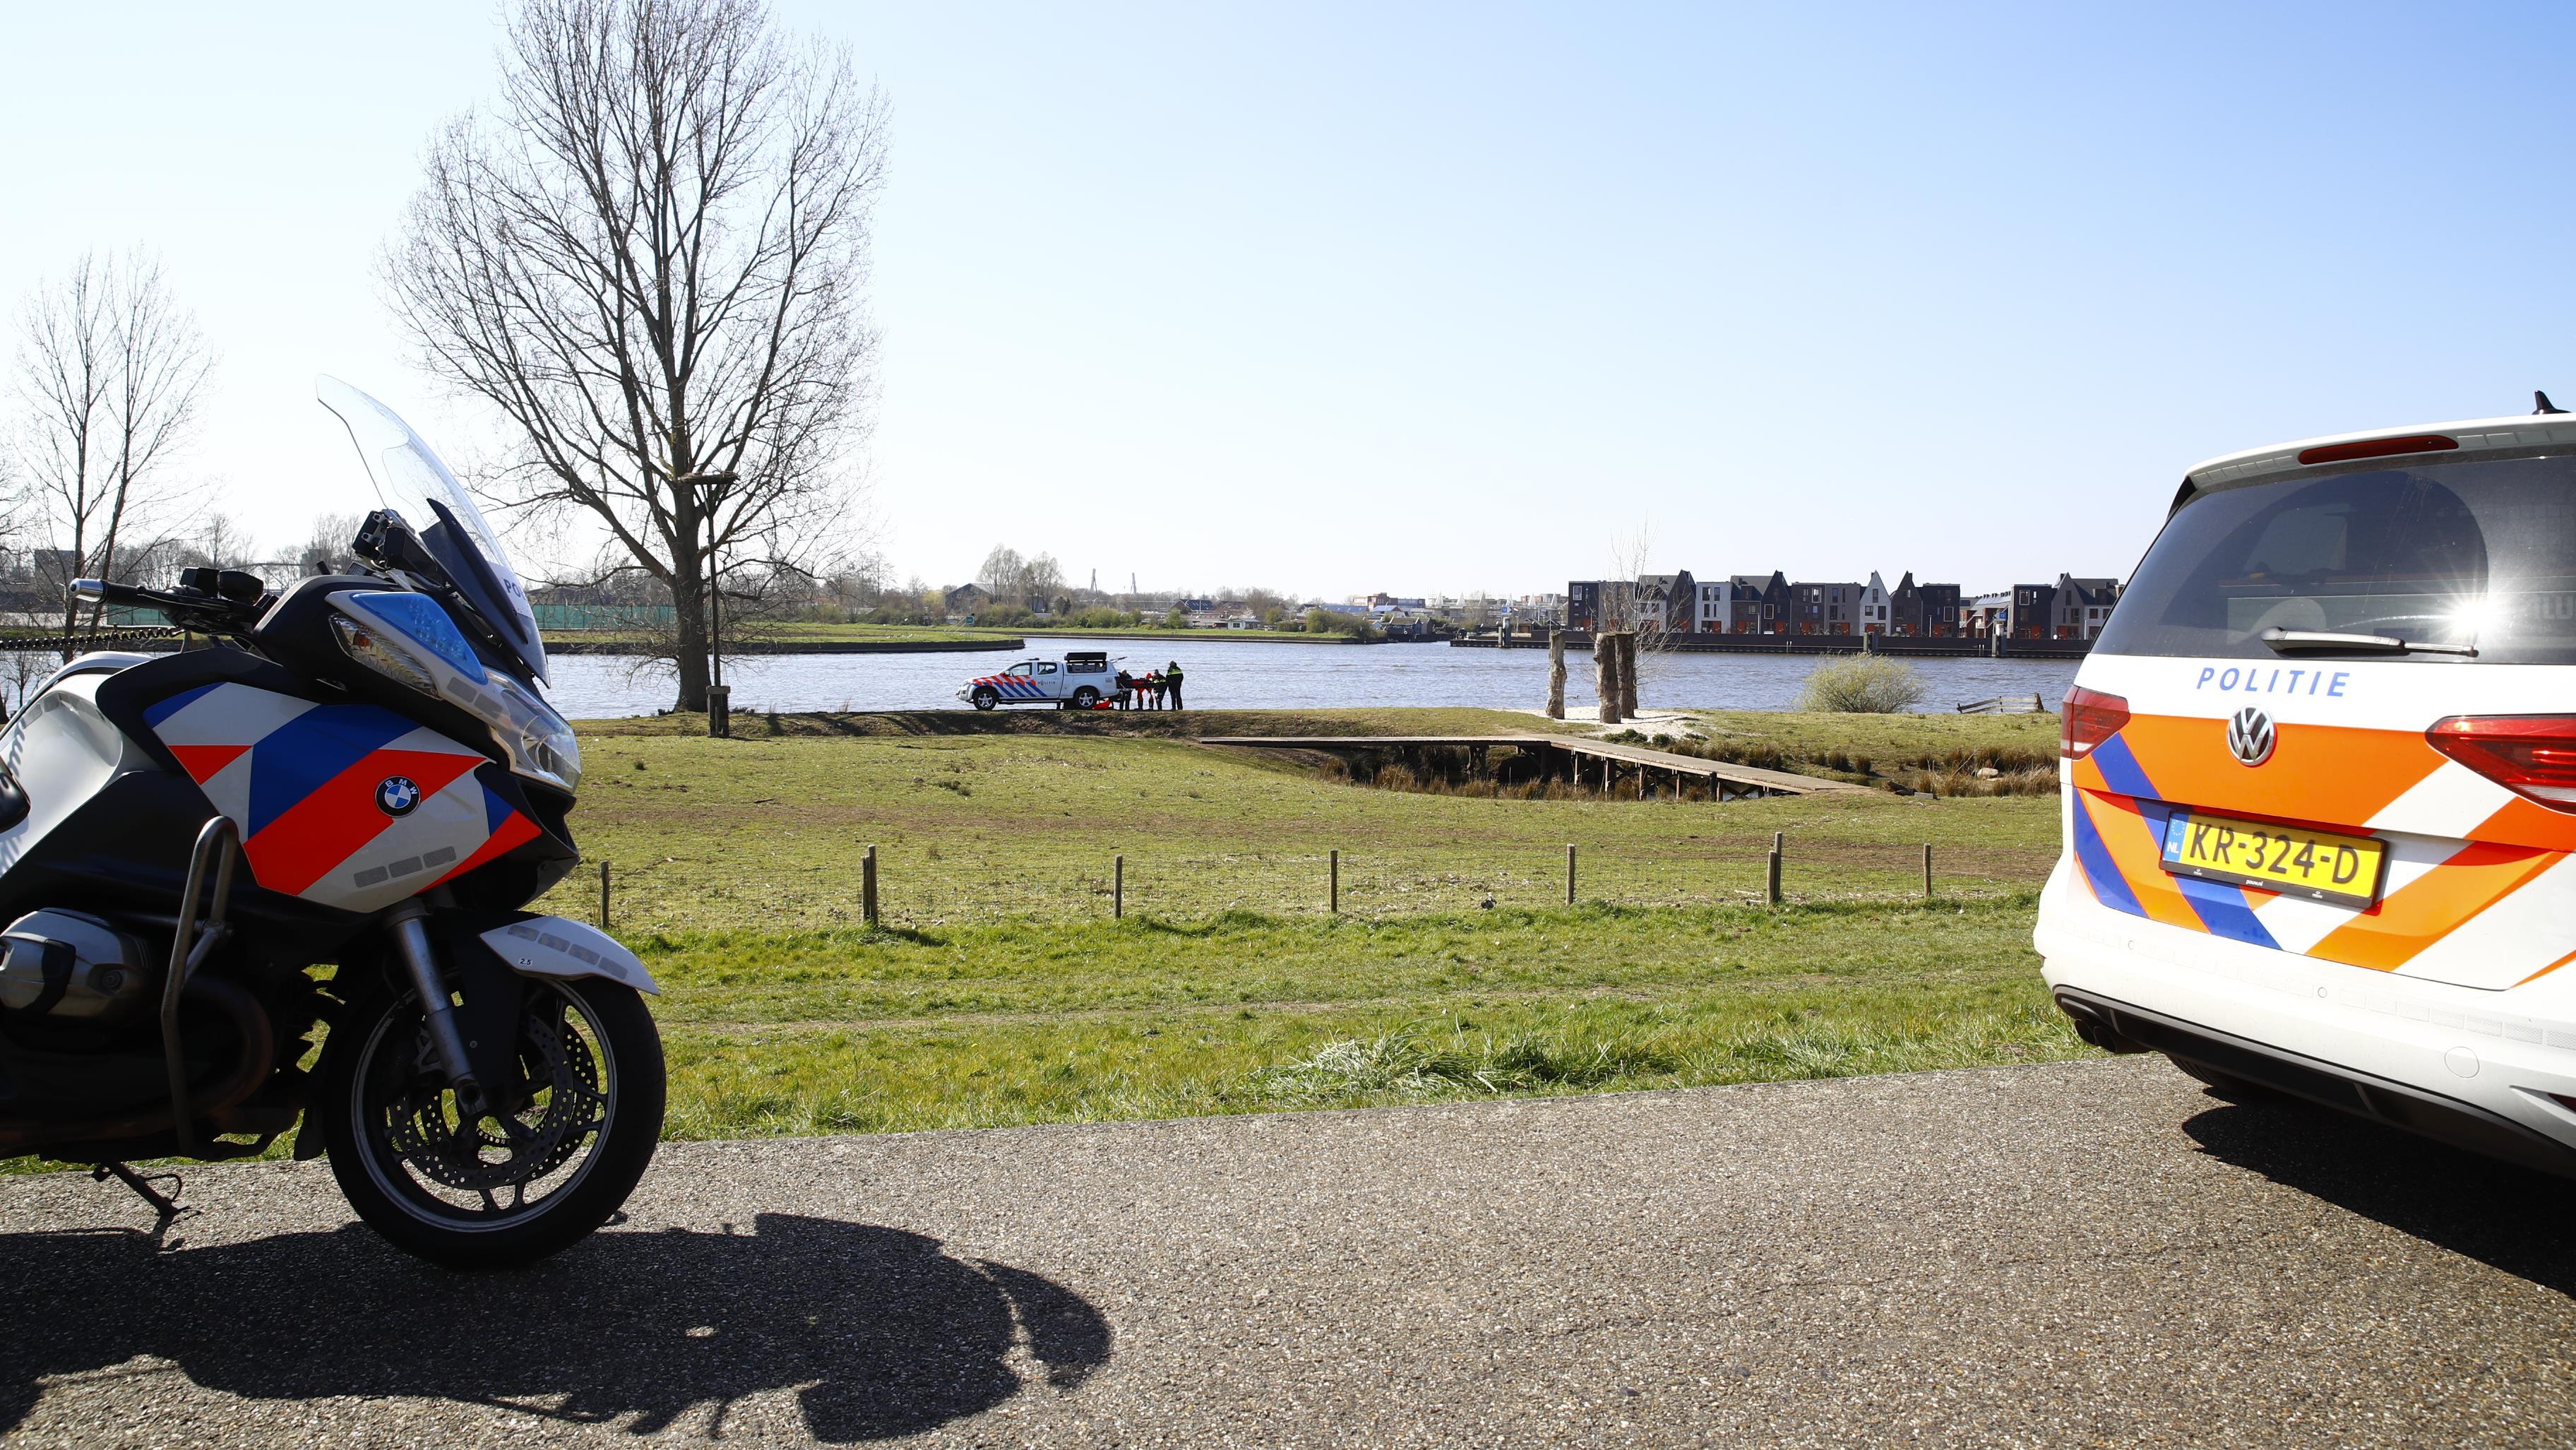 Lichaam gevonden in water bij Zwolle